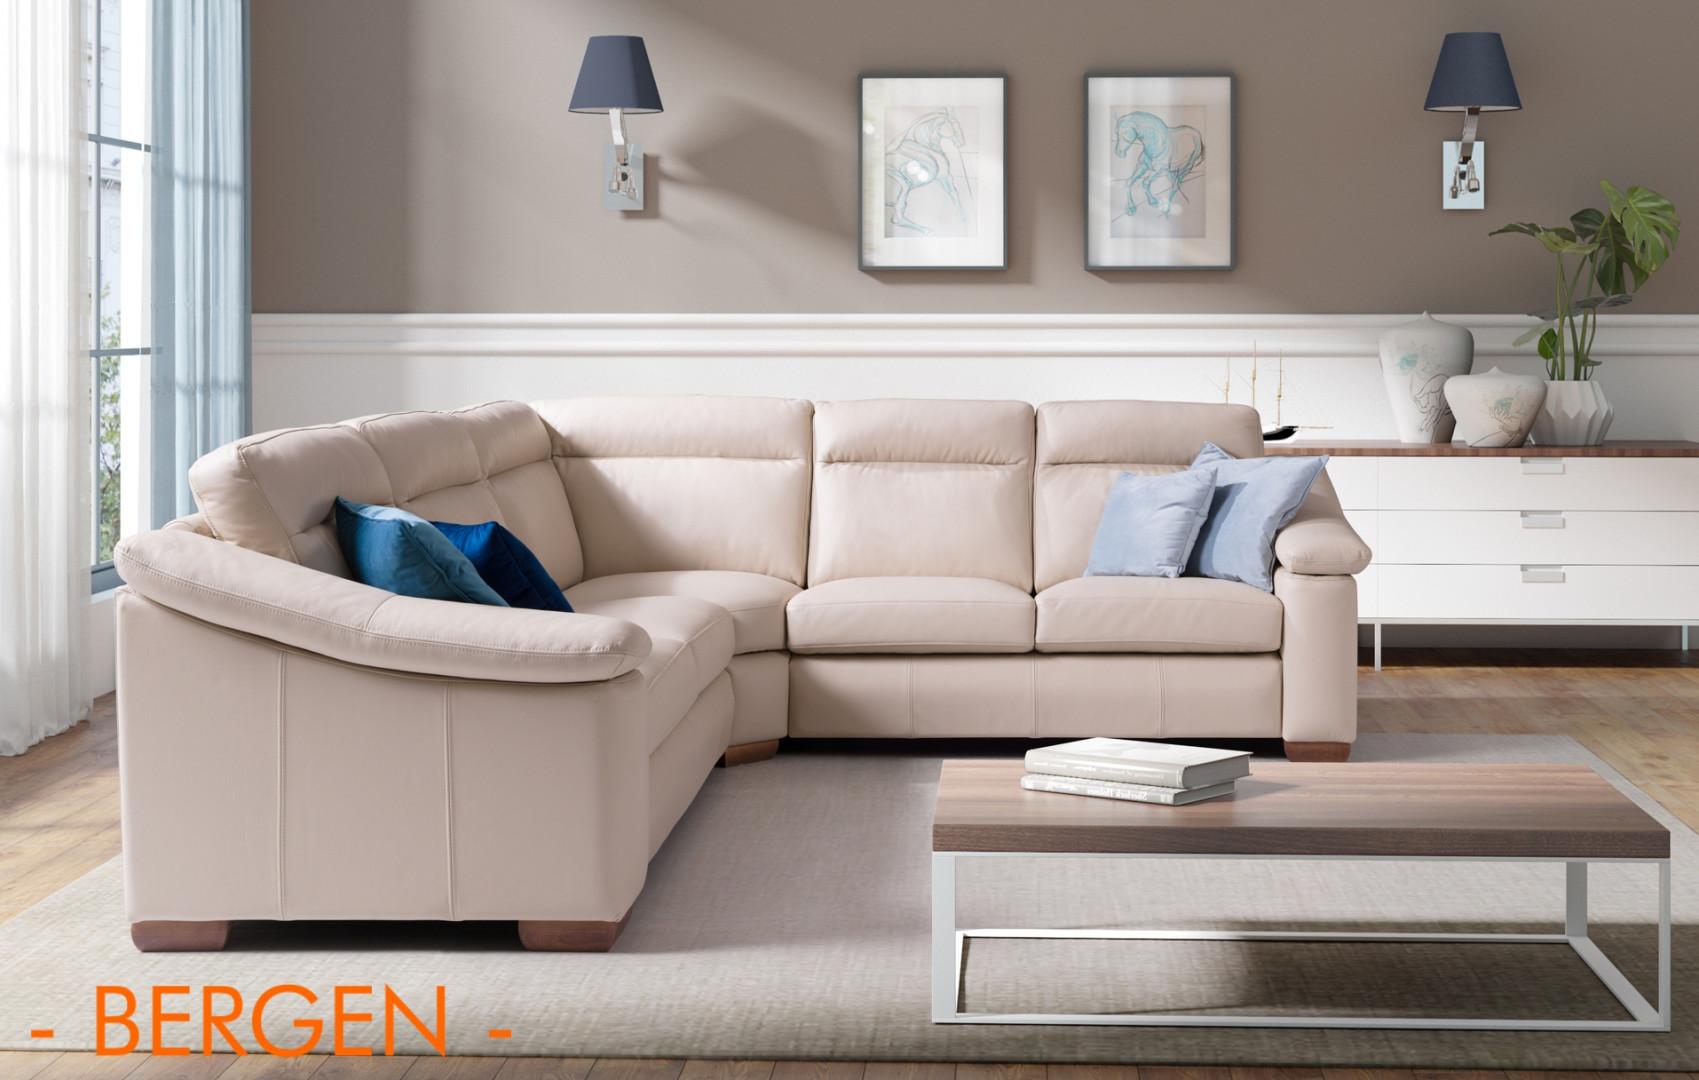 Sofa Bergen. Fot. Wajnert Meble